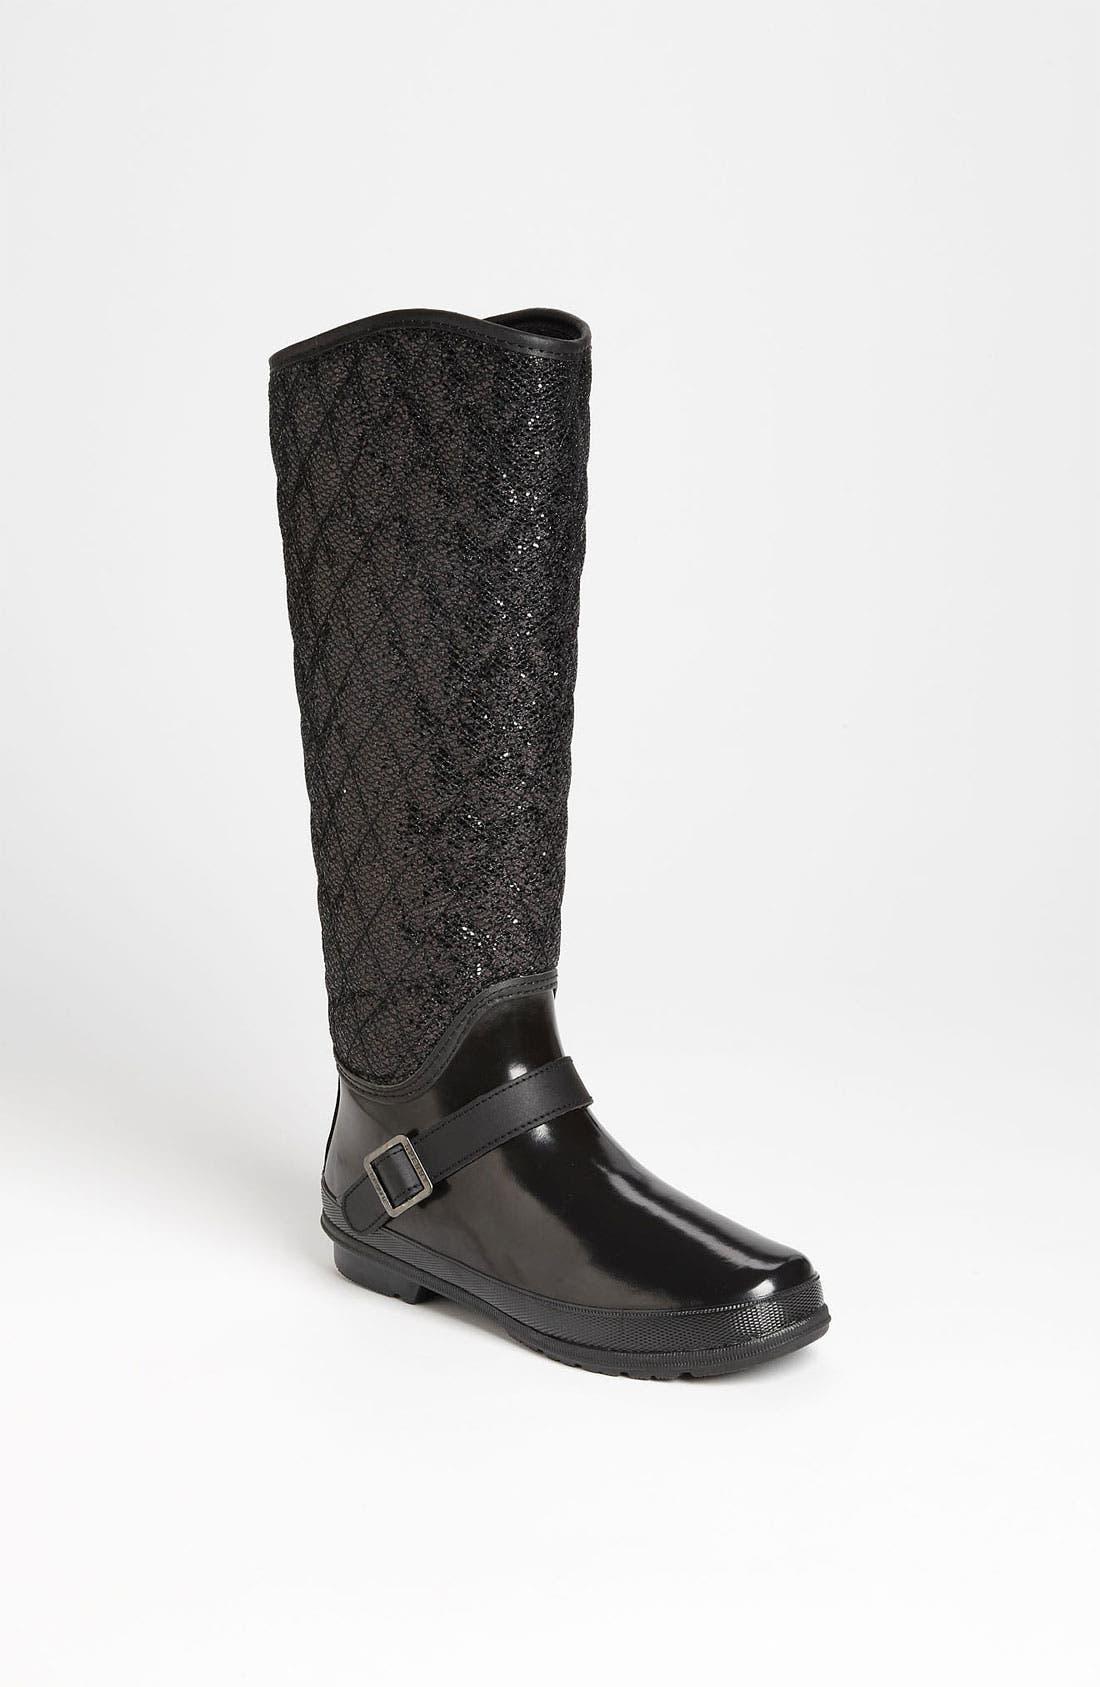 Alternate Image 1 Selected - Sperry Top-Sider® 'Hingham' Rain Boot (Women)